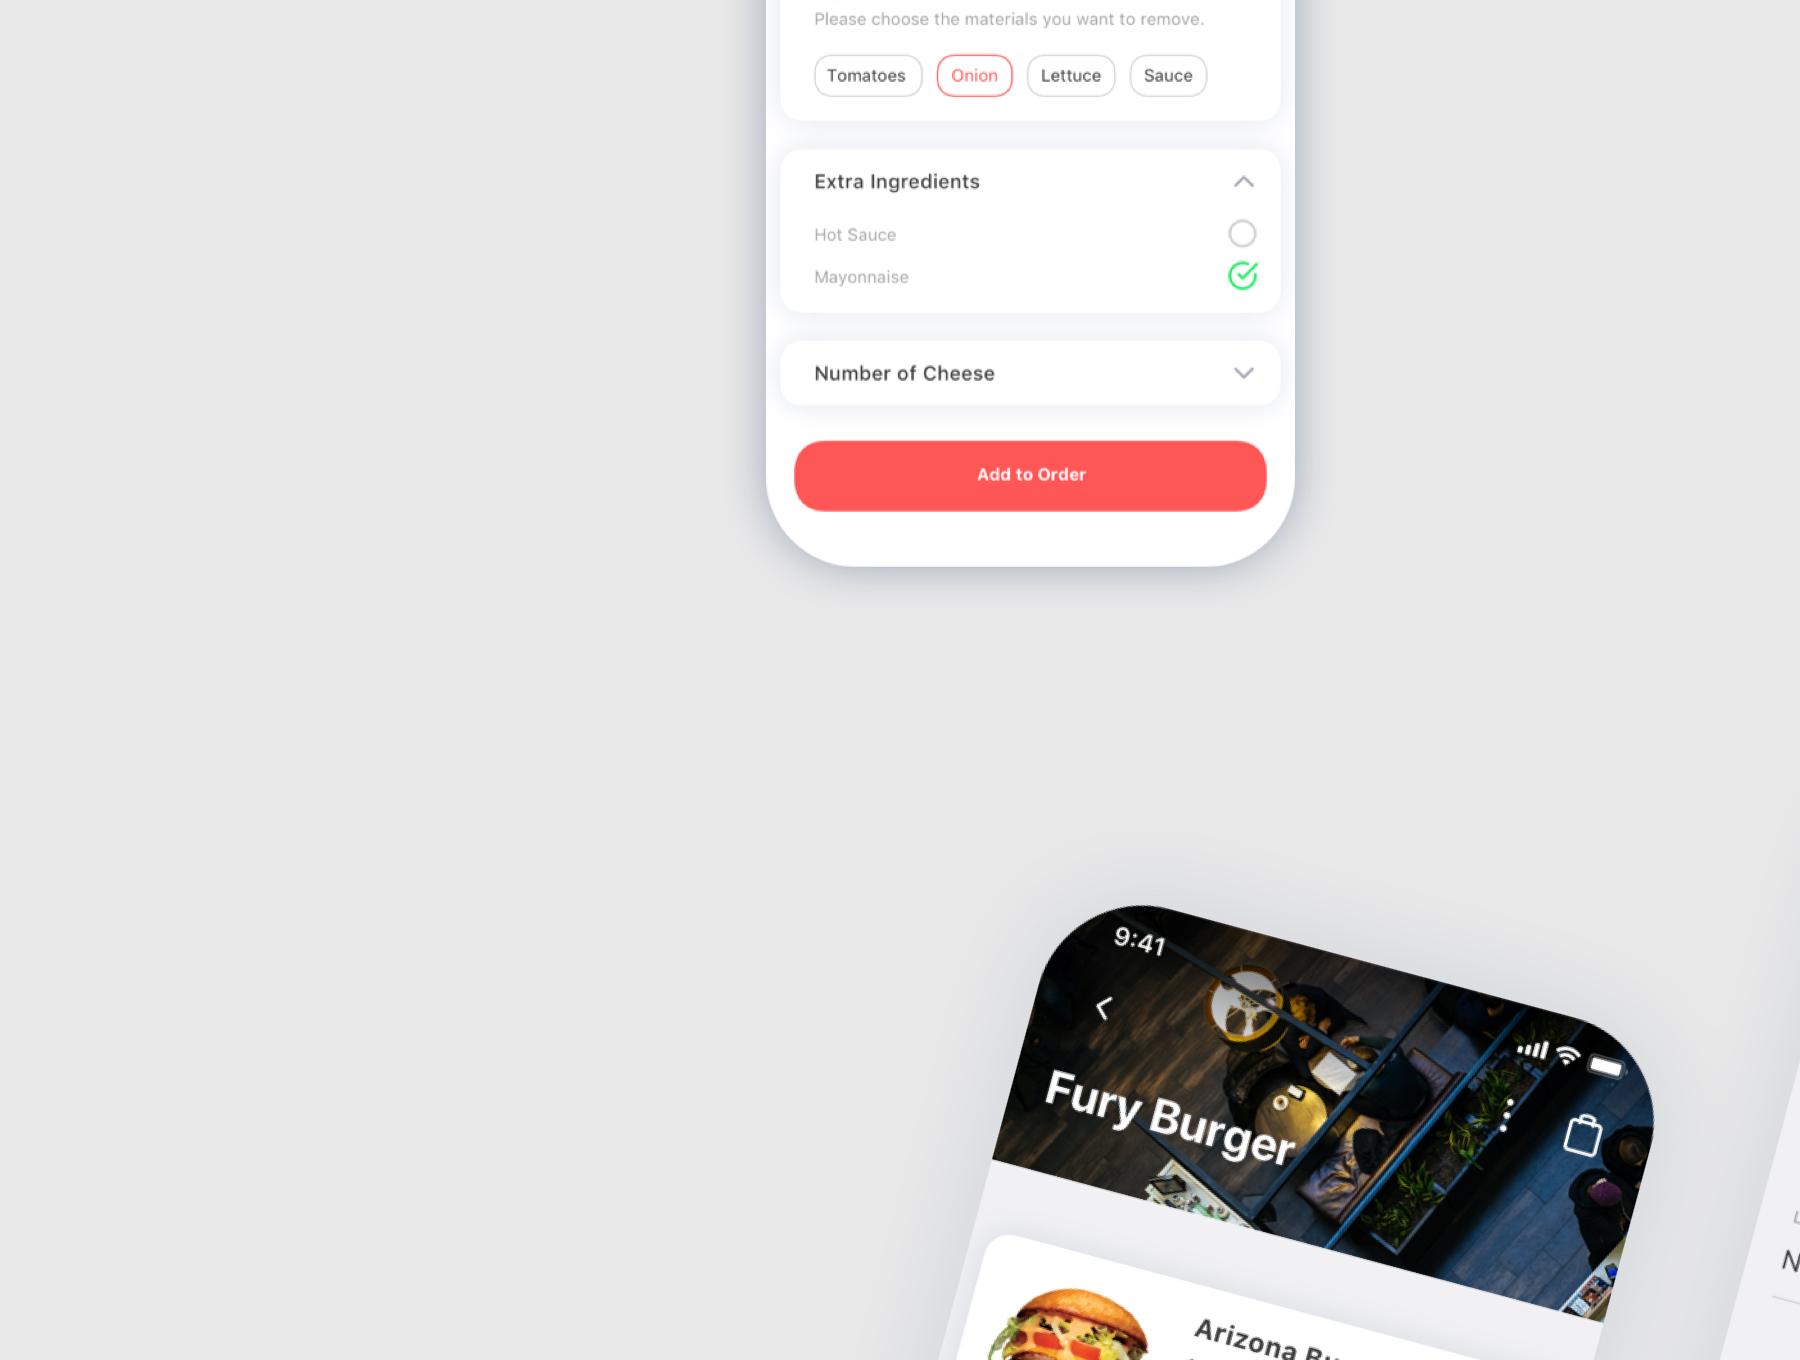 食物外卖配送应用APP设计UI套件 Spes Food Delivery App UI Kit插图(3)